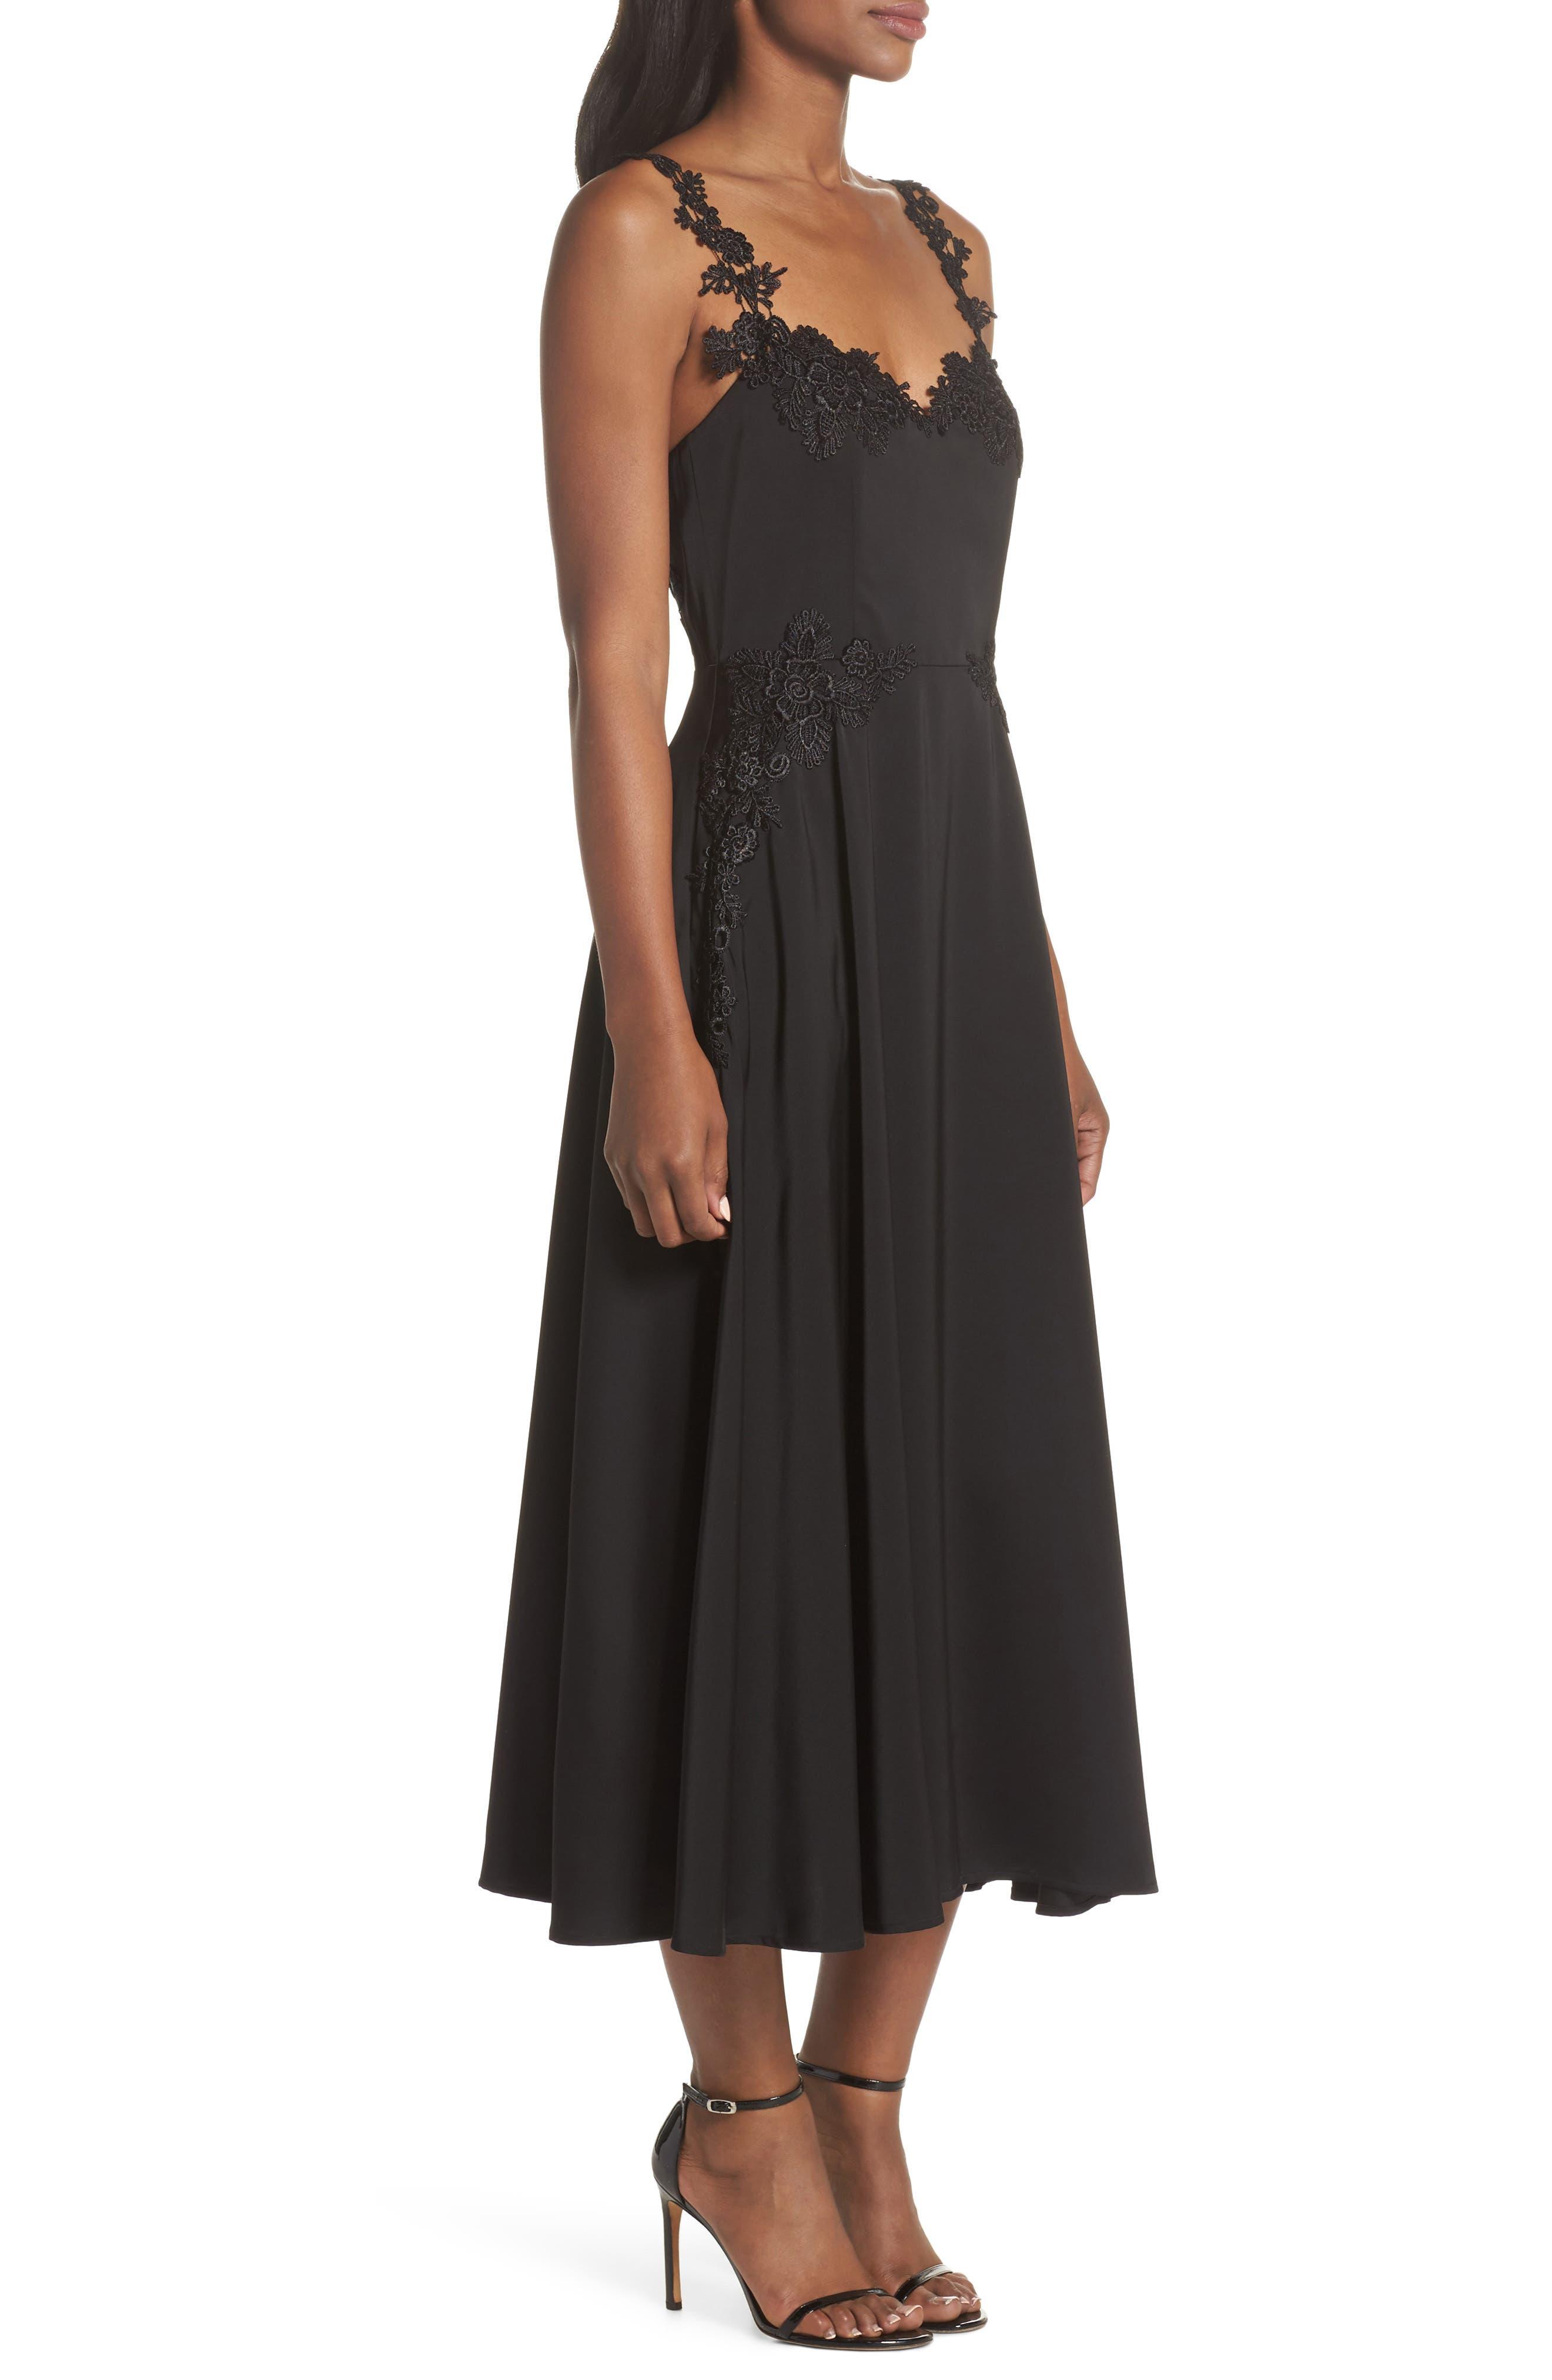 Aislinn Floral Appliqué Tea Length Dress,                             Alternate thumbnail 3, color,                             Black Multi